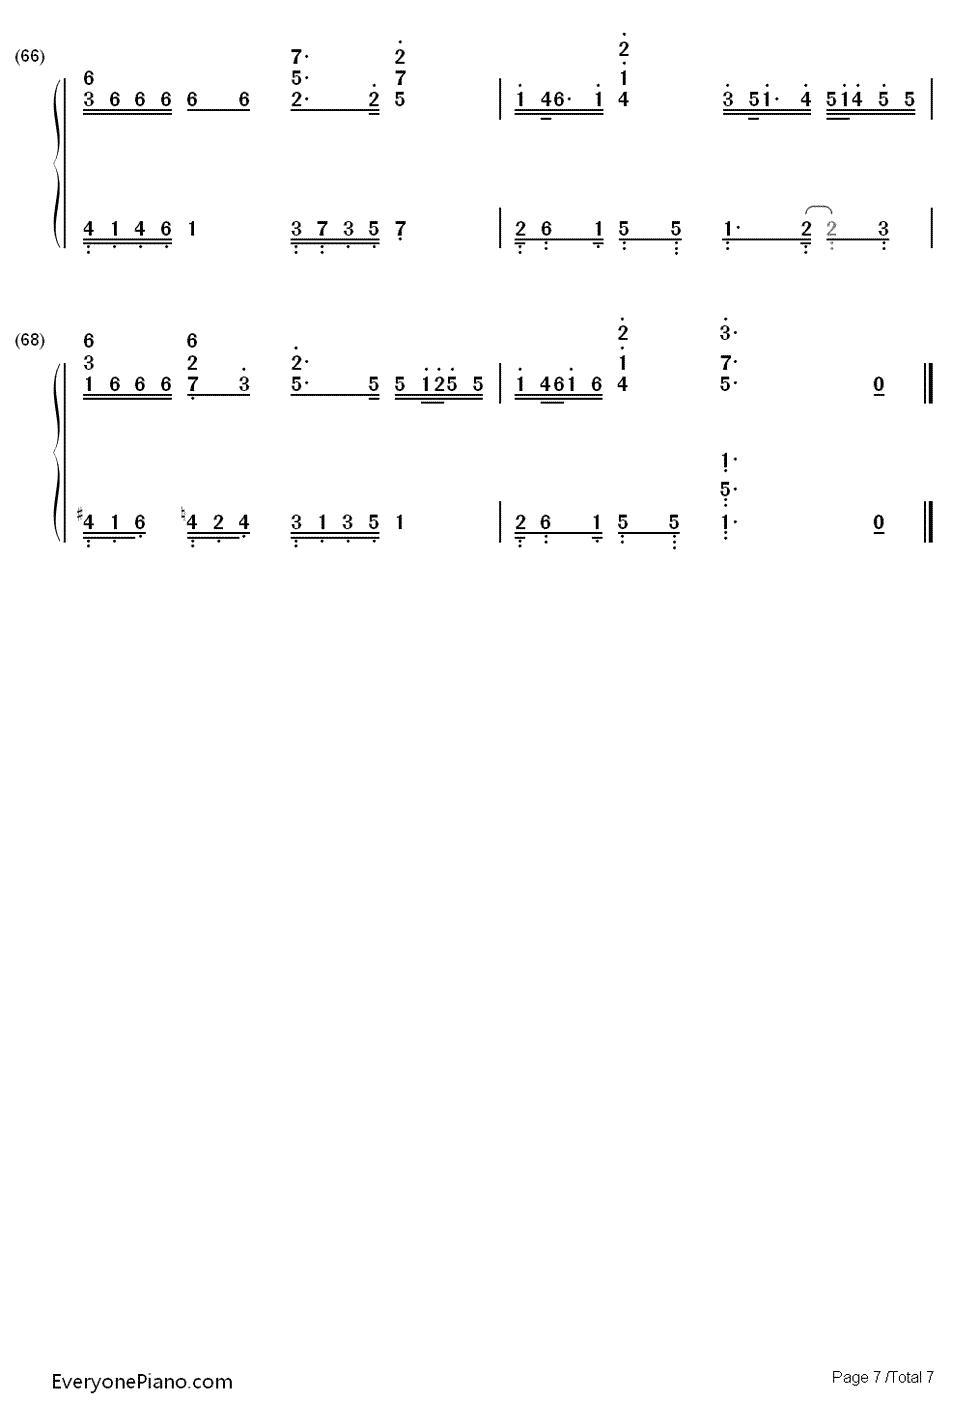 lion heart-smap-eop教学曲双手简谱预览7